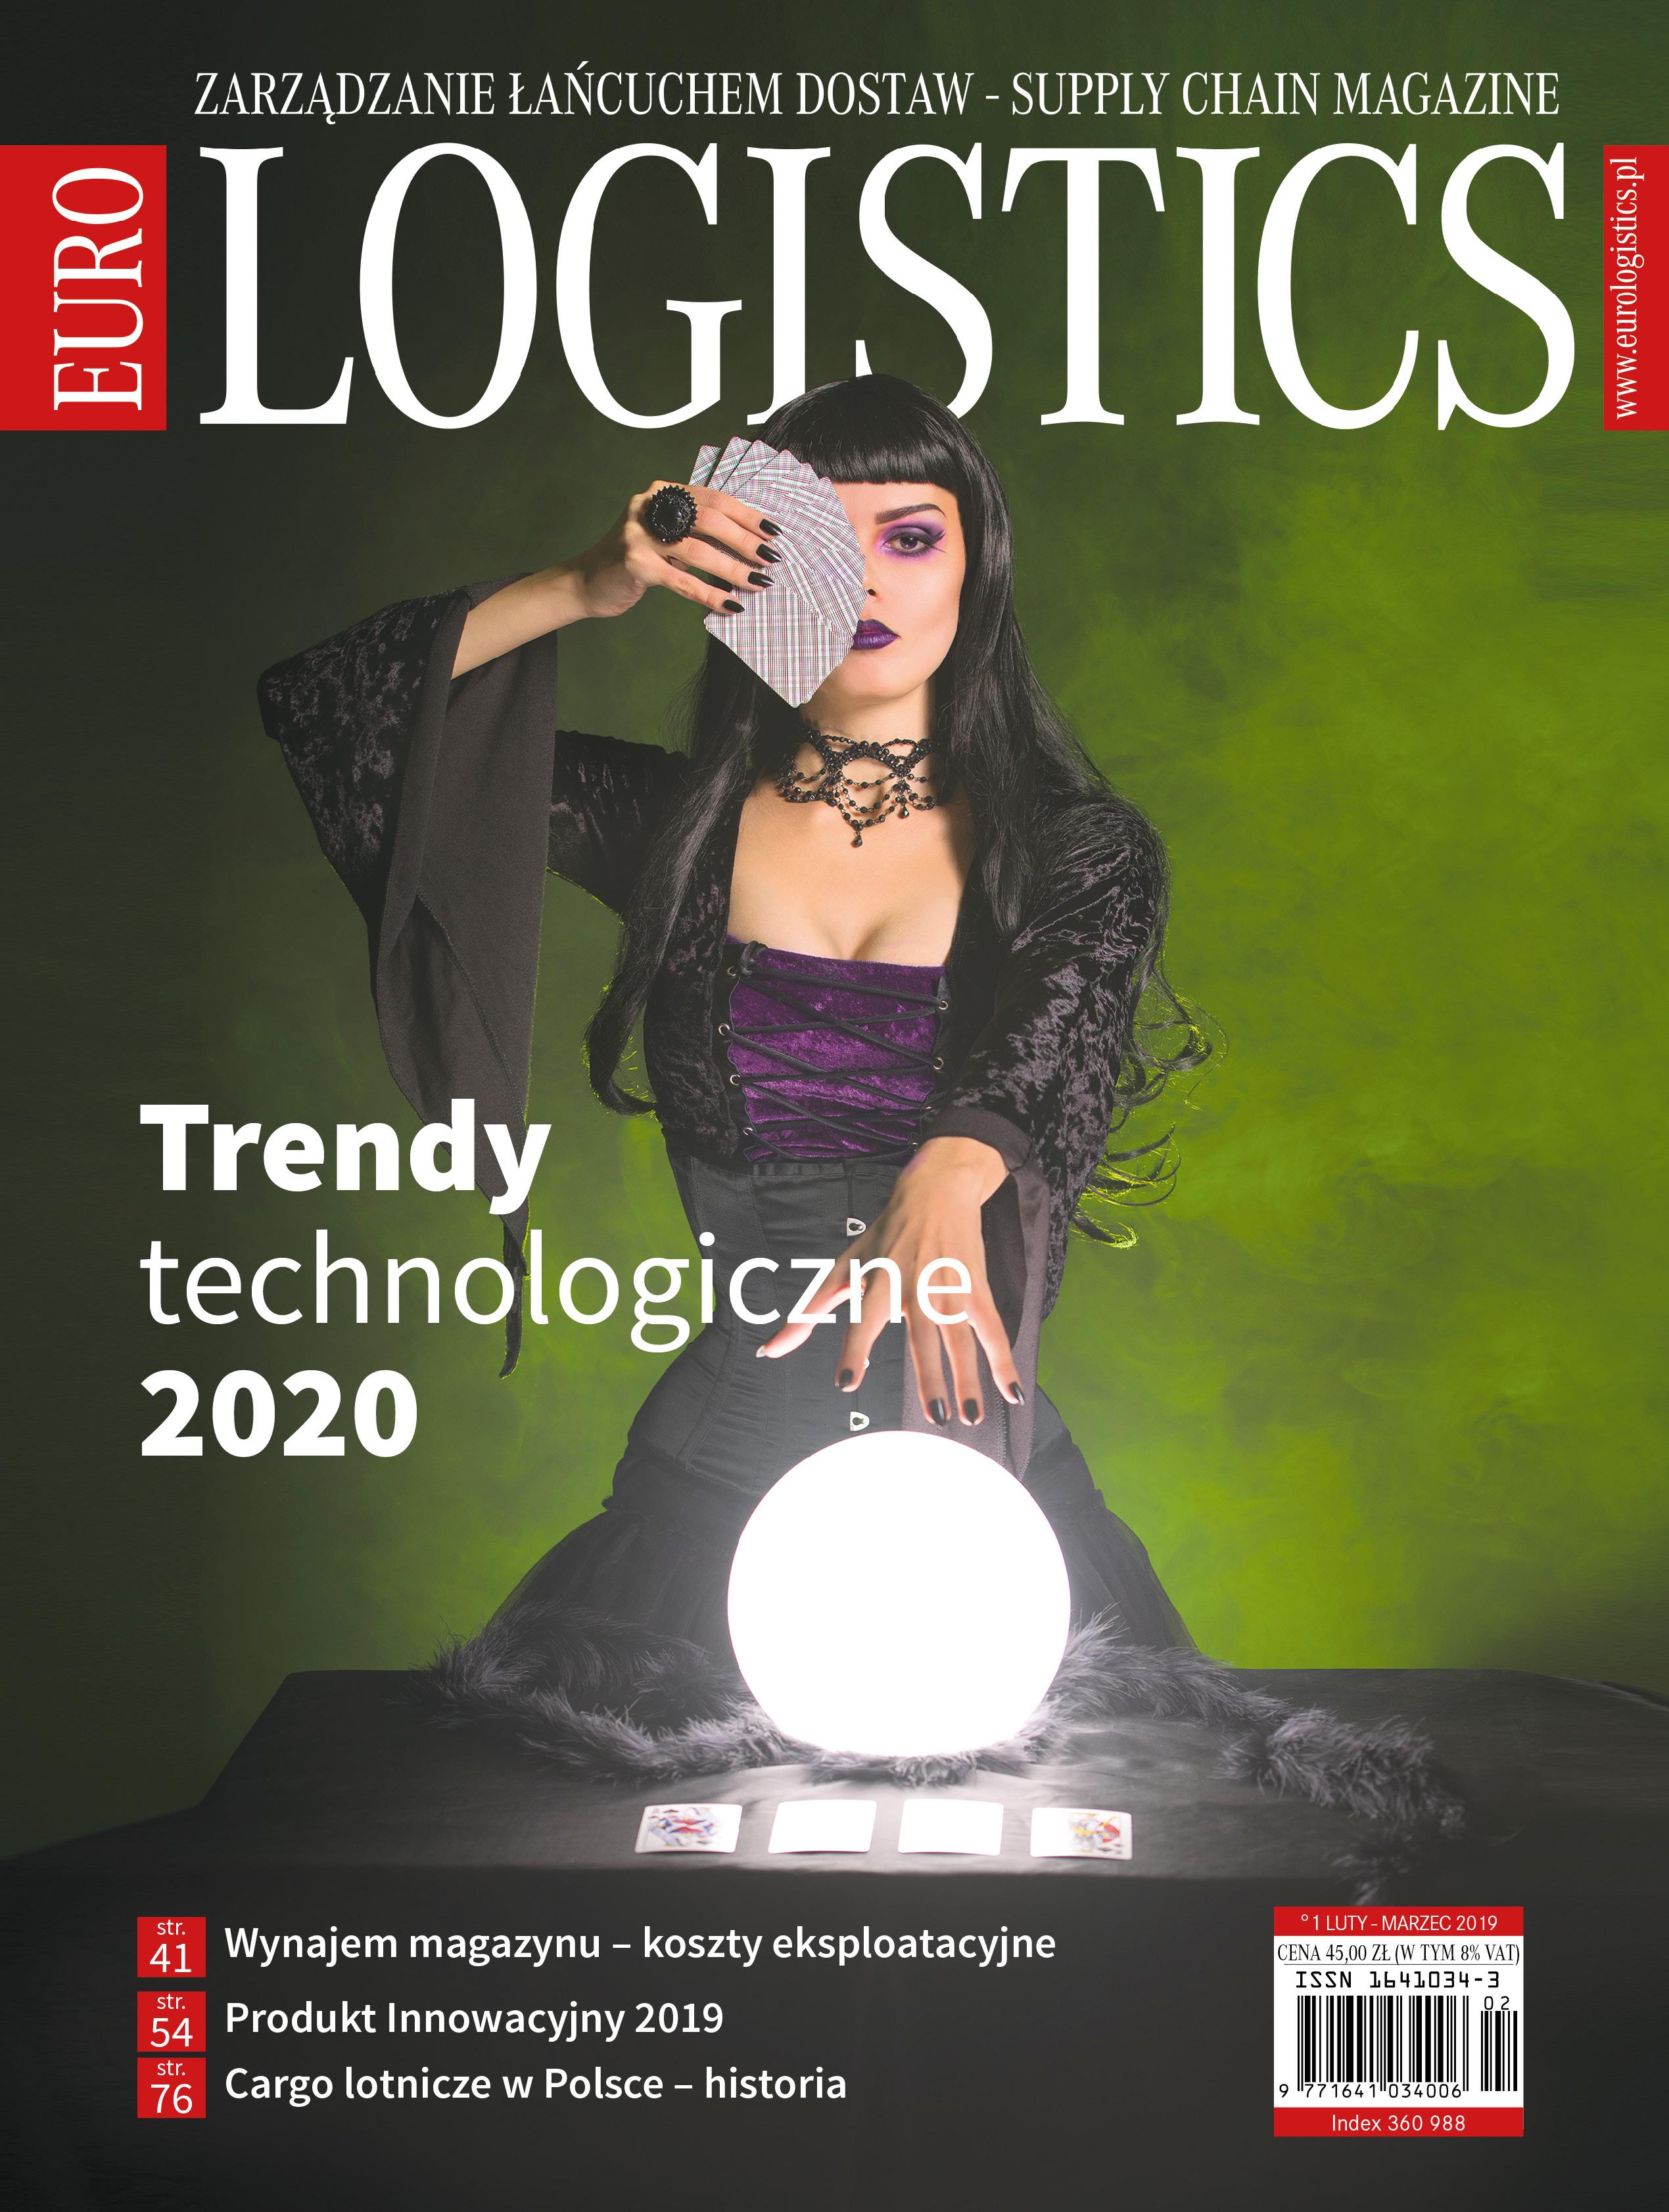 Trendy technologiczne 2020